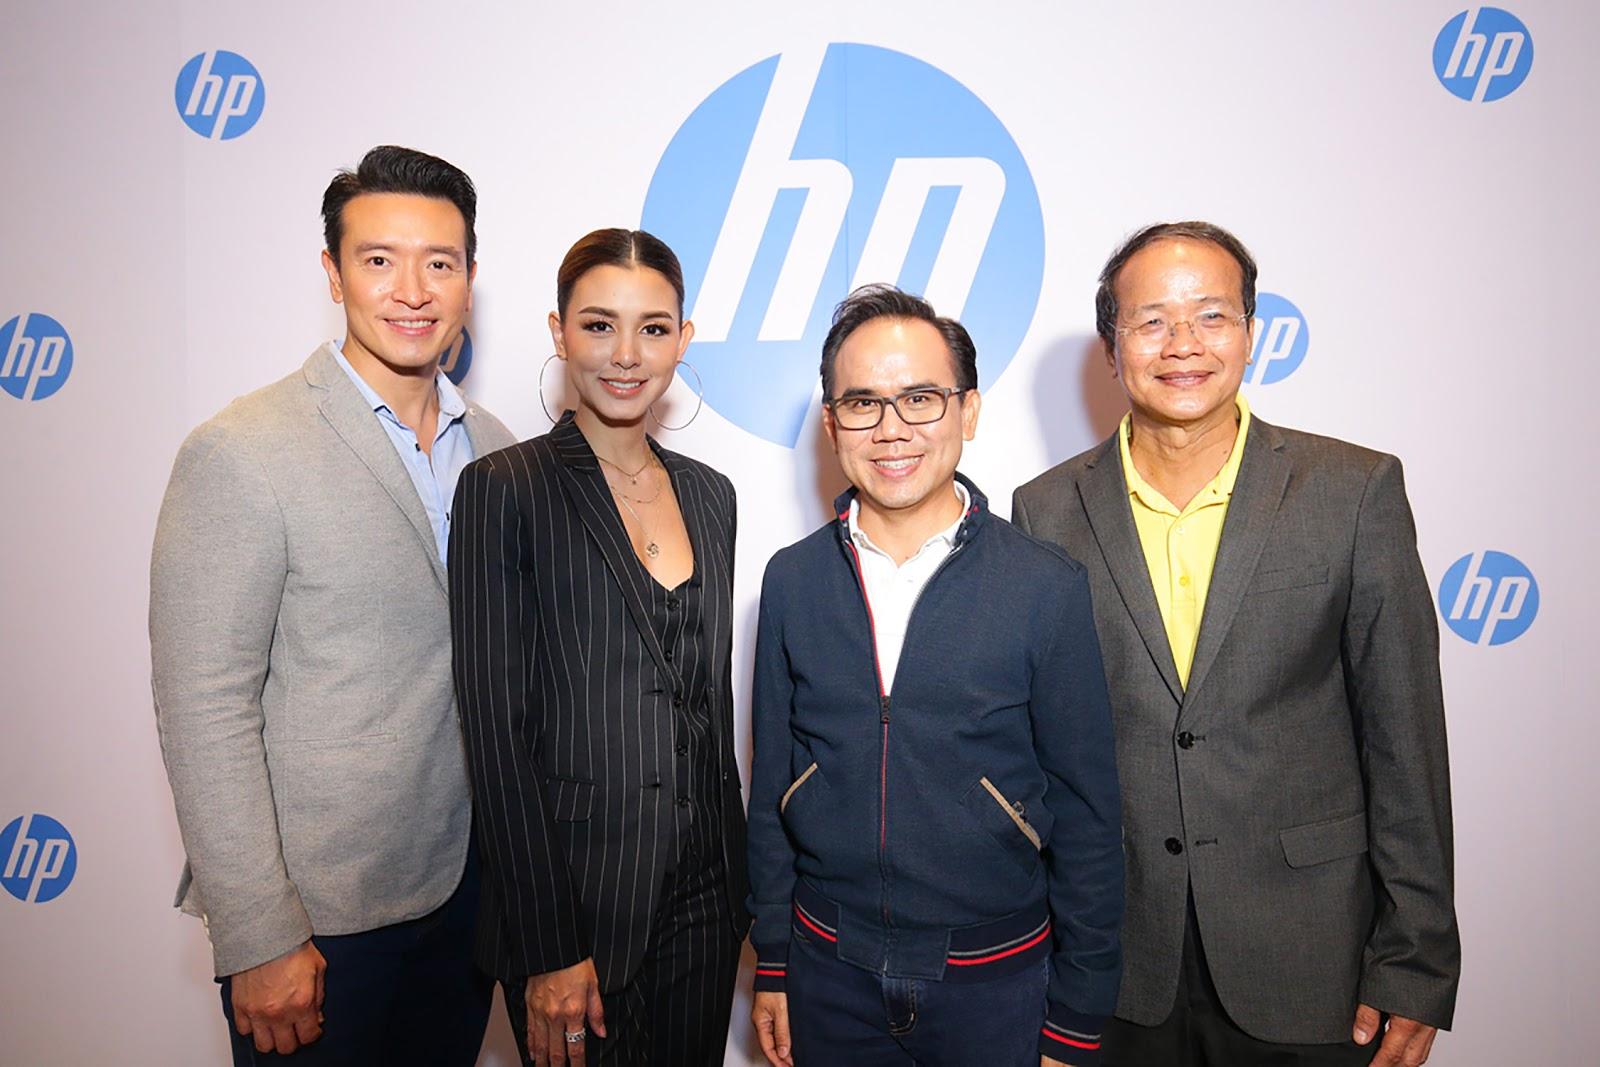 HP จัดเสวนาผลสำรวจ New Asian Learning Experience เผยสถิติ และหัวข้อความสนใจของครอบครัวยุคใหม่ต่อการเรียนรู้ของลูกเพื่อวางรากฐานสู่อนาคต HP Identifies Parental Focus on Preparing Children Future Ready